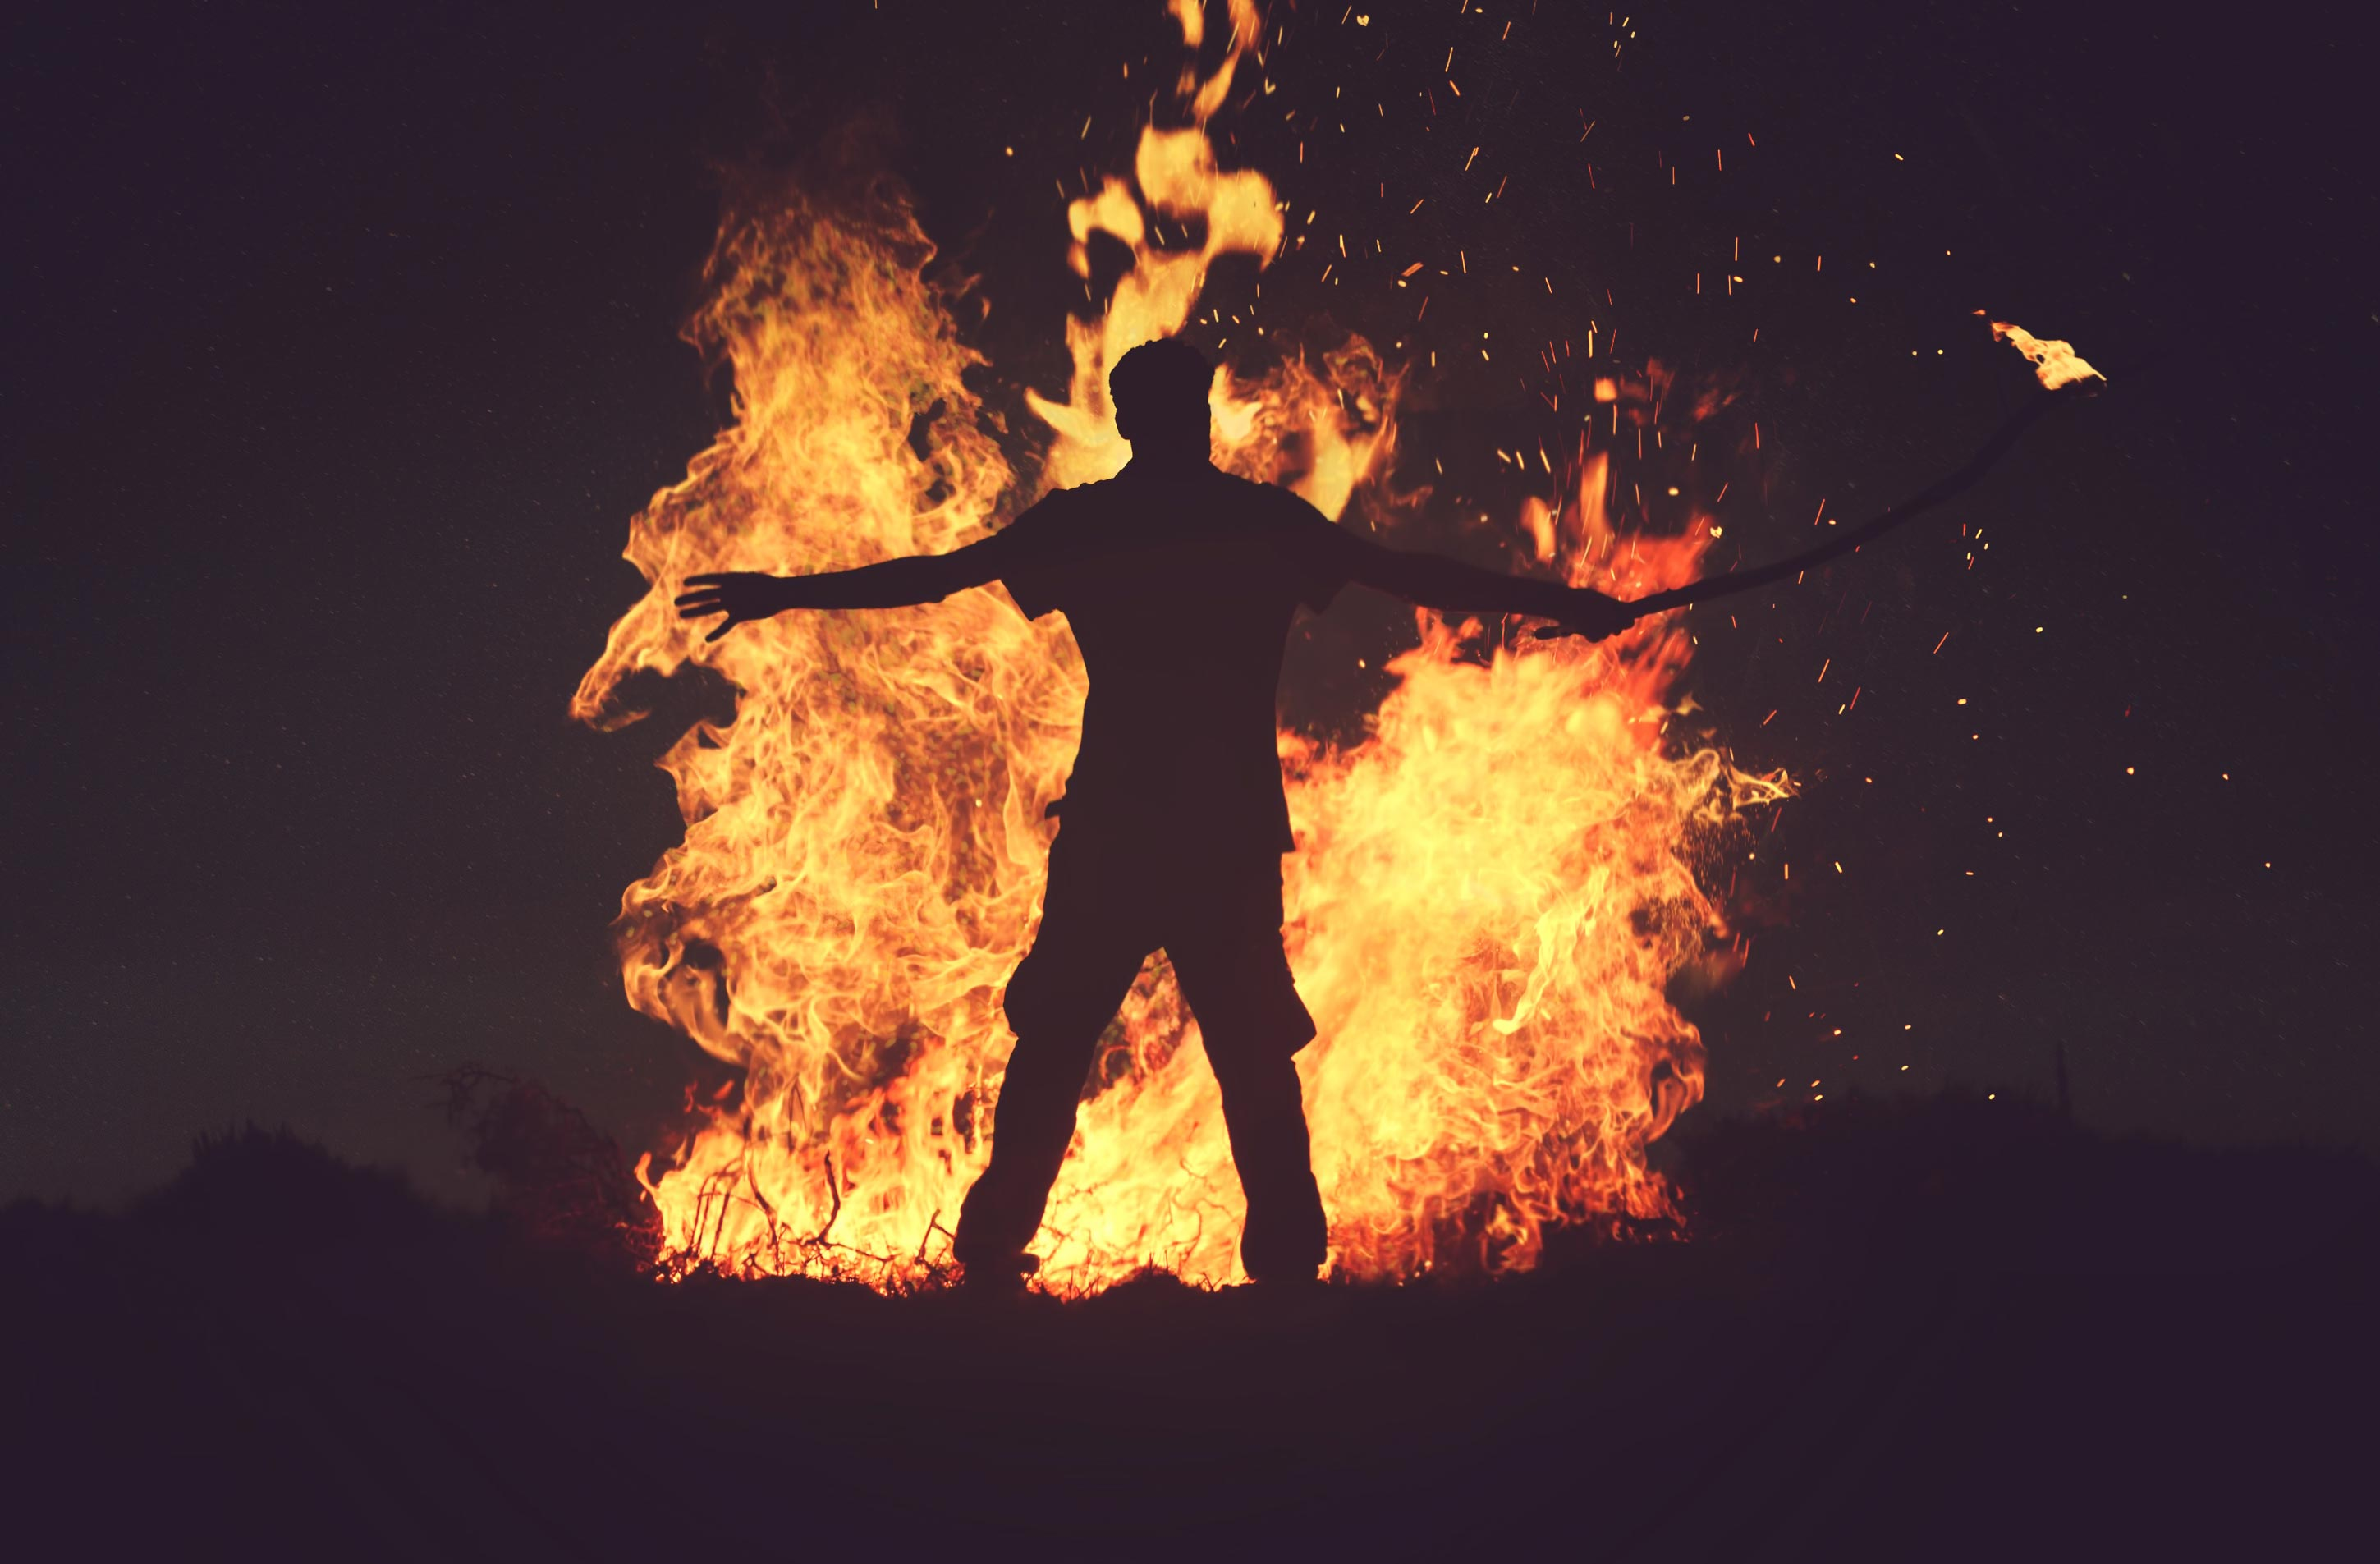 Feuertaufe einer neuen Material Art